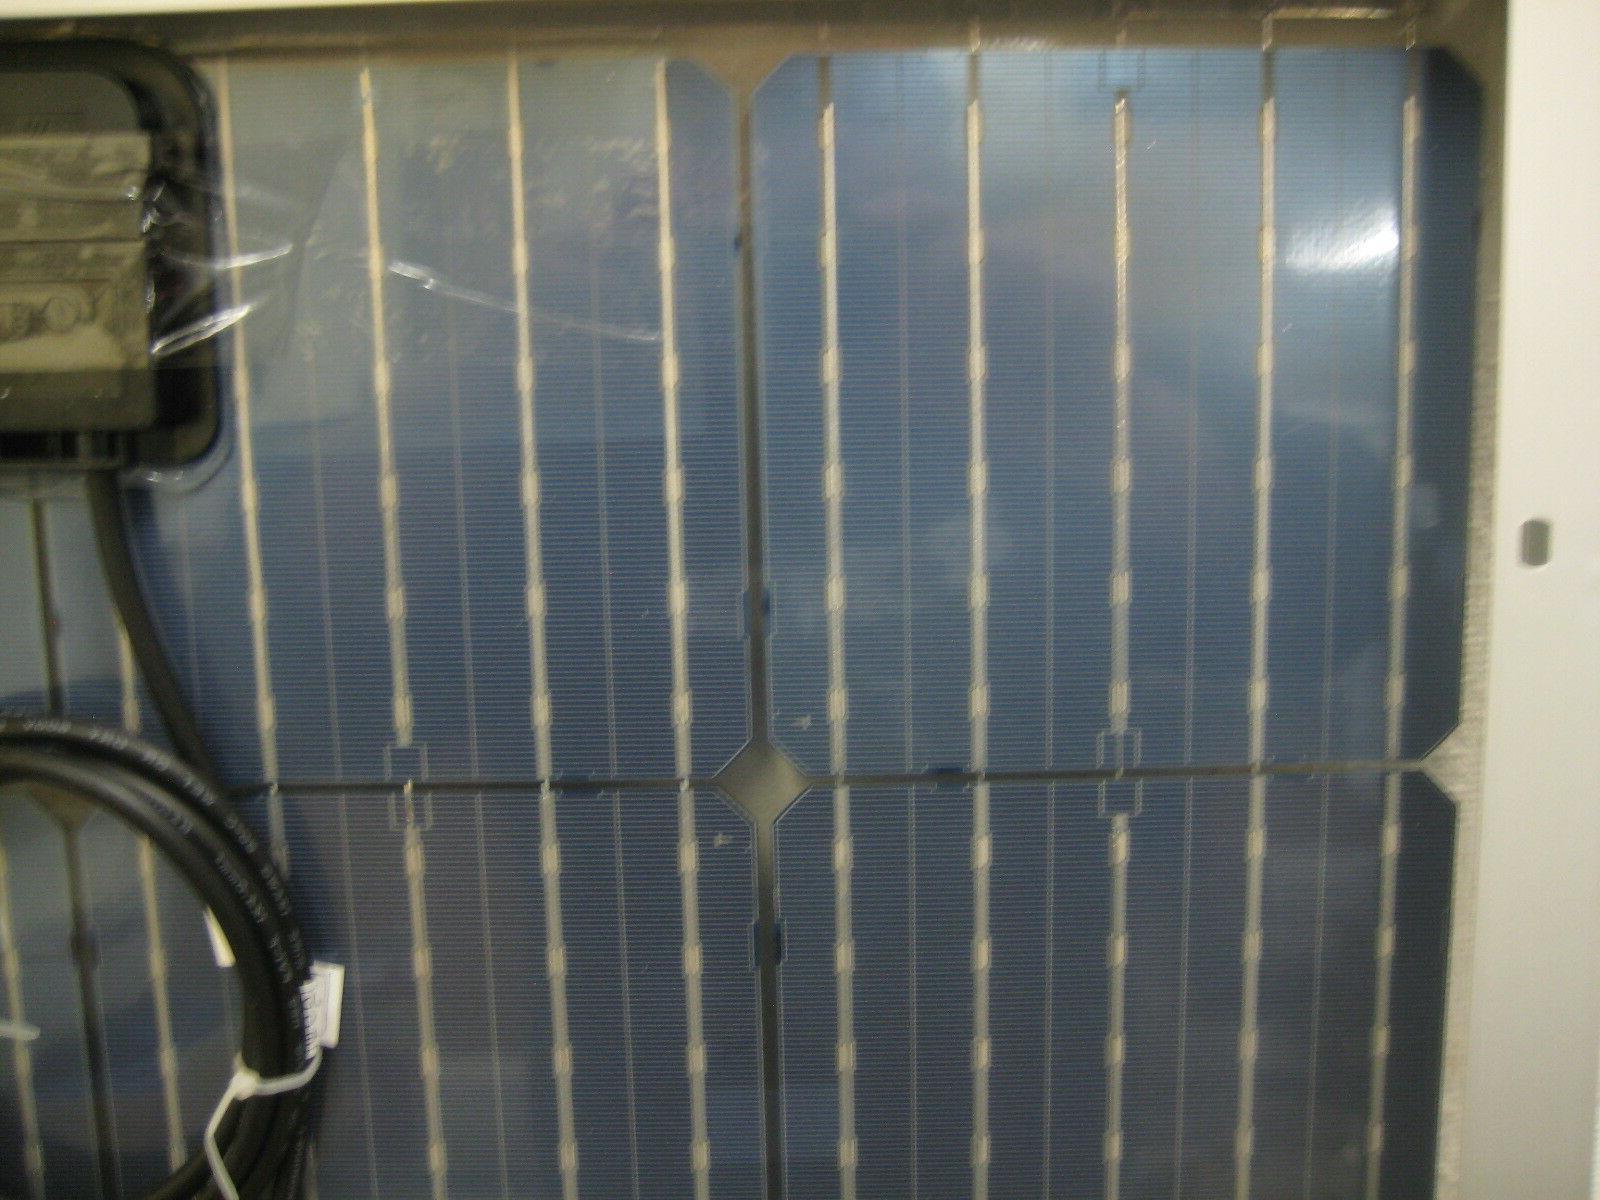 200+25% Solar Off RV highest power 12V